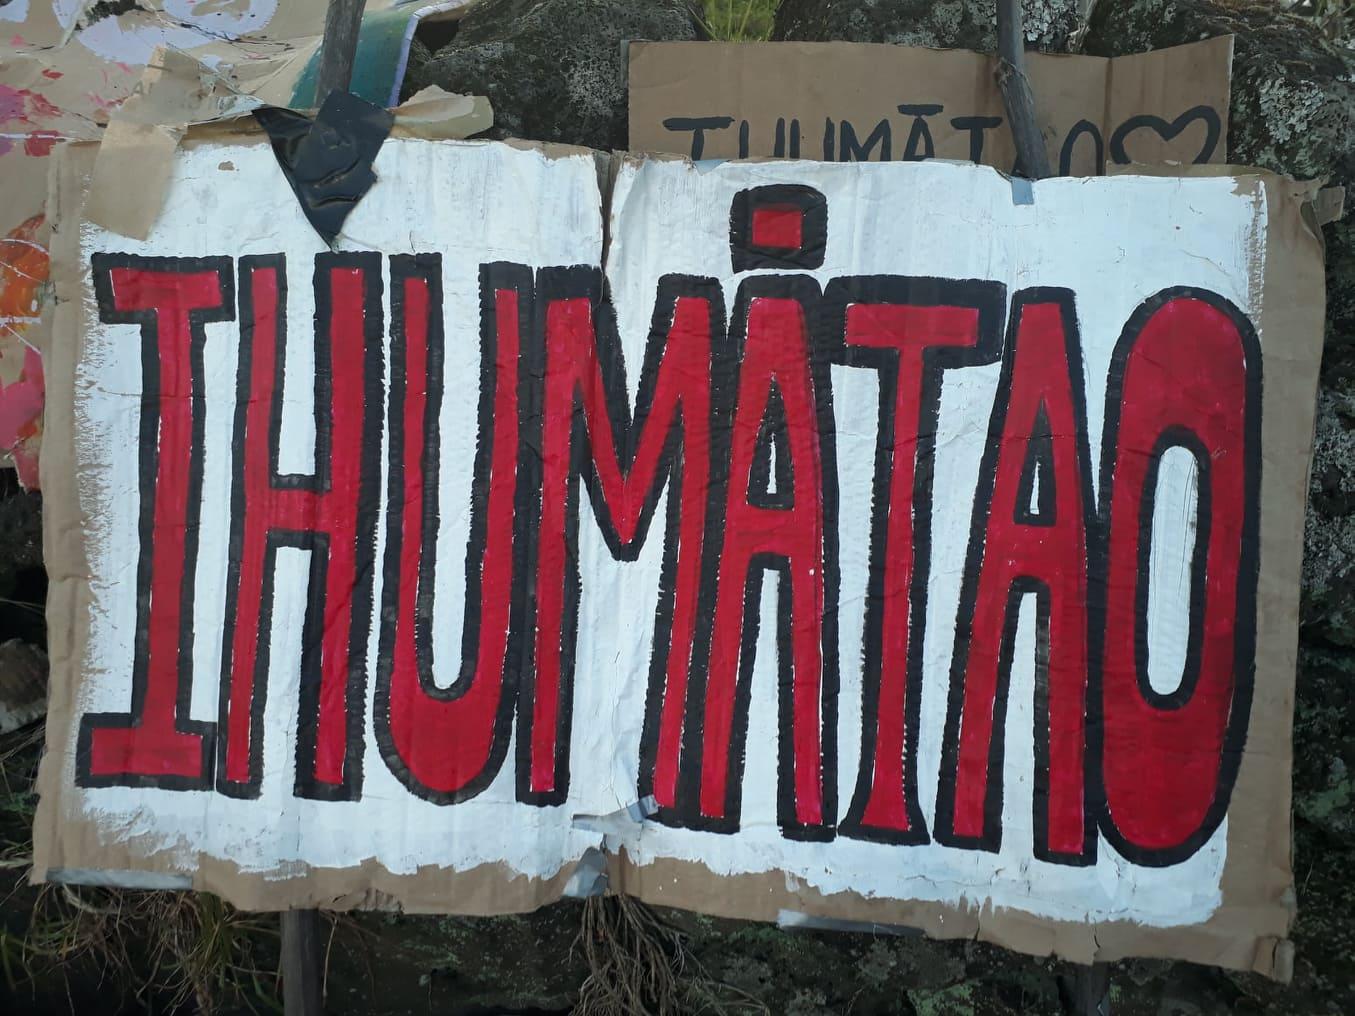 Banner from demonstration